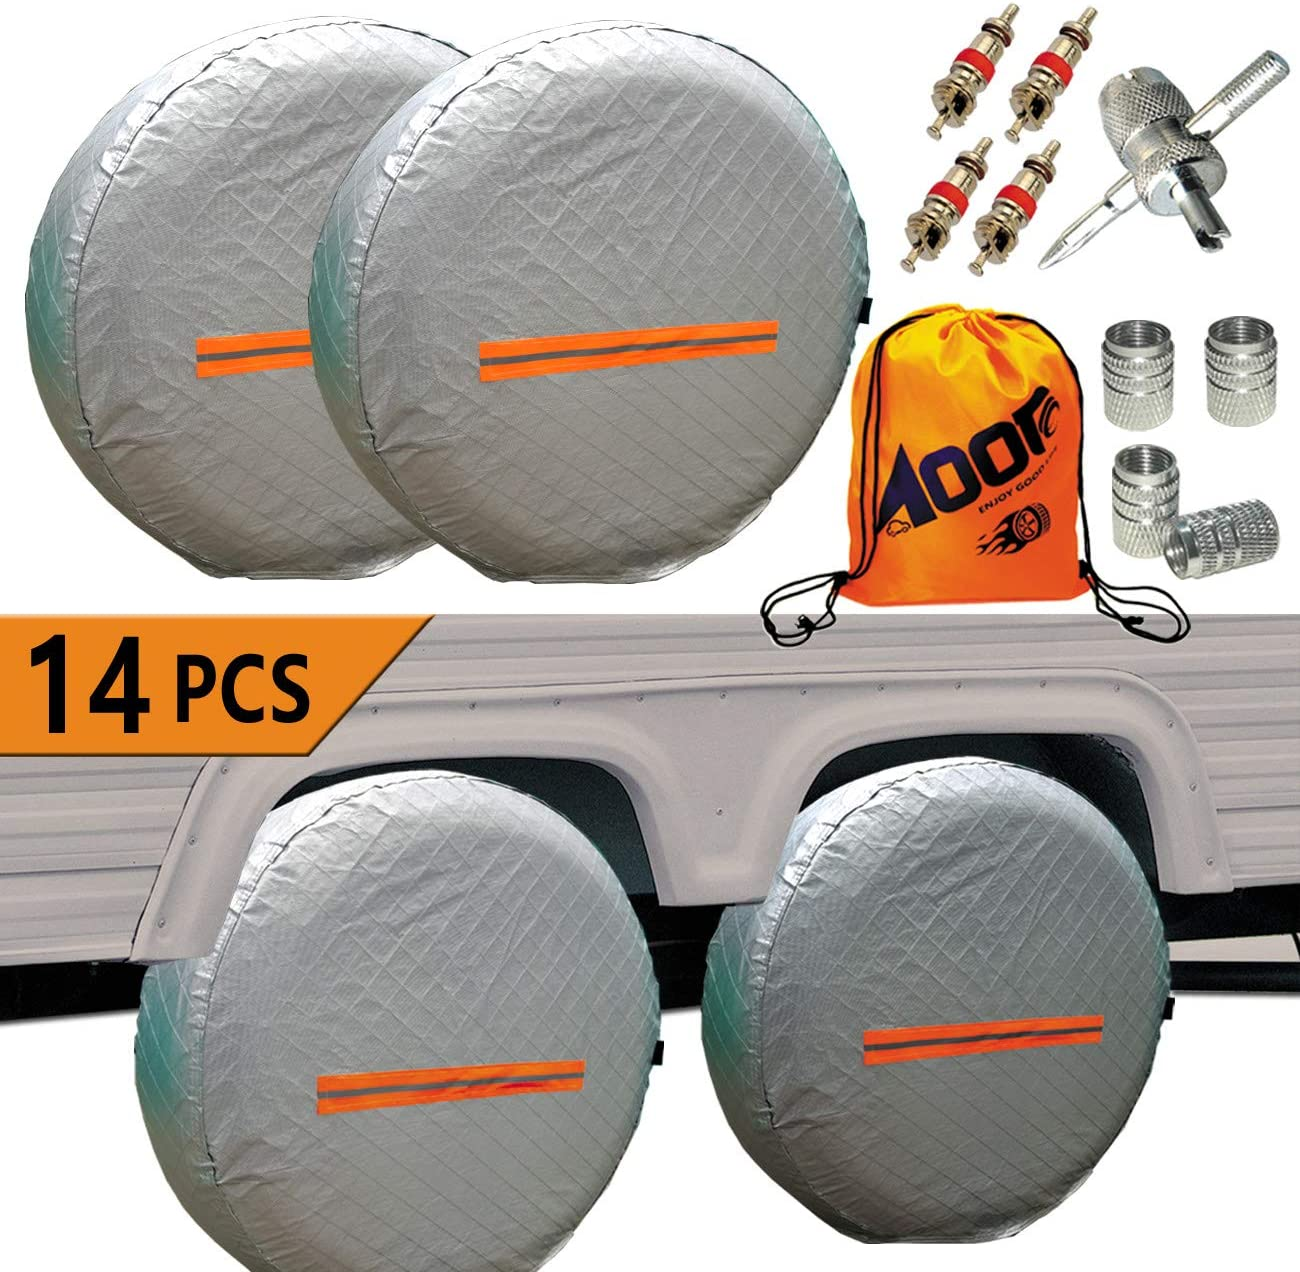 Set of 4 Tire Covers Tire Protectors,Waterproof Aluminum Film Tire Sun Protectors//Weatherproof ,Fits 26 to 29 Tire Diameters Black